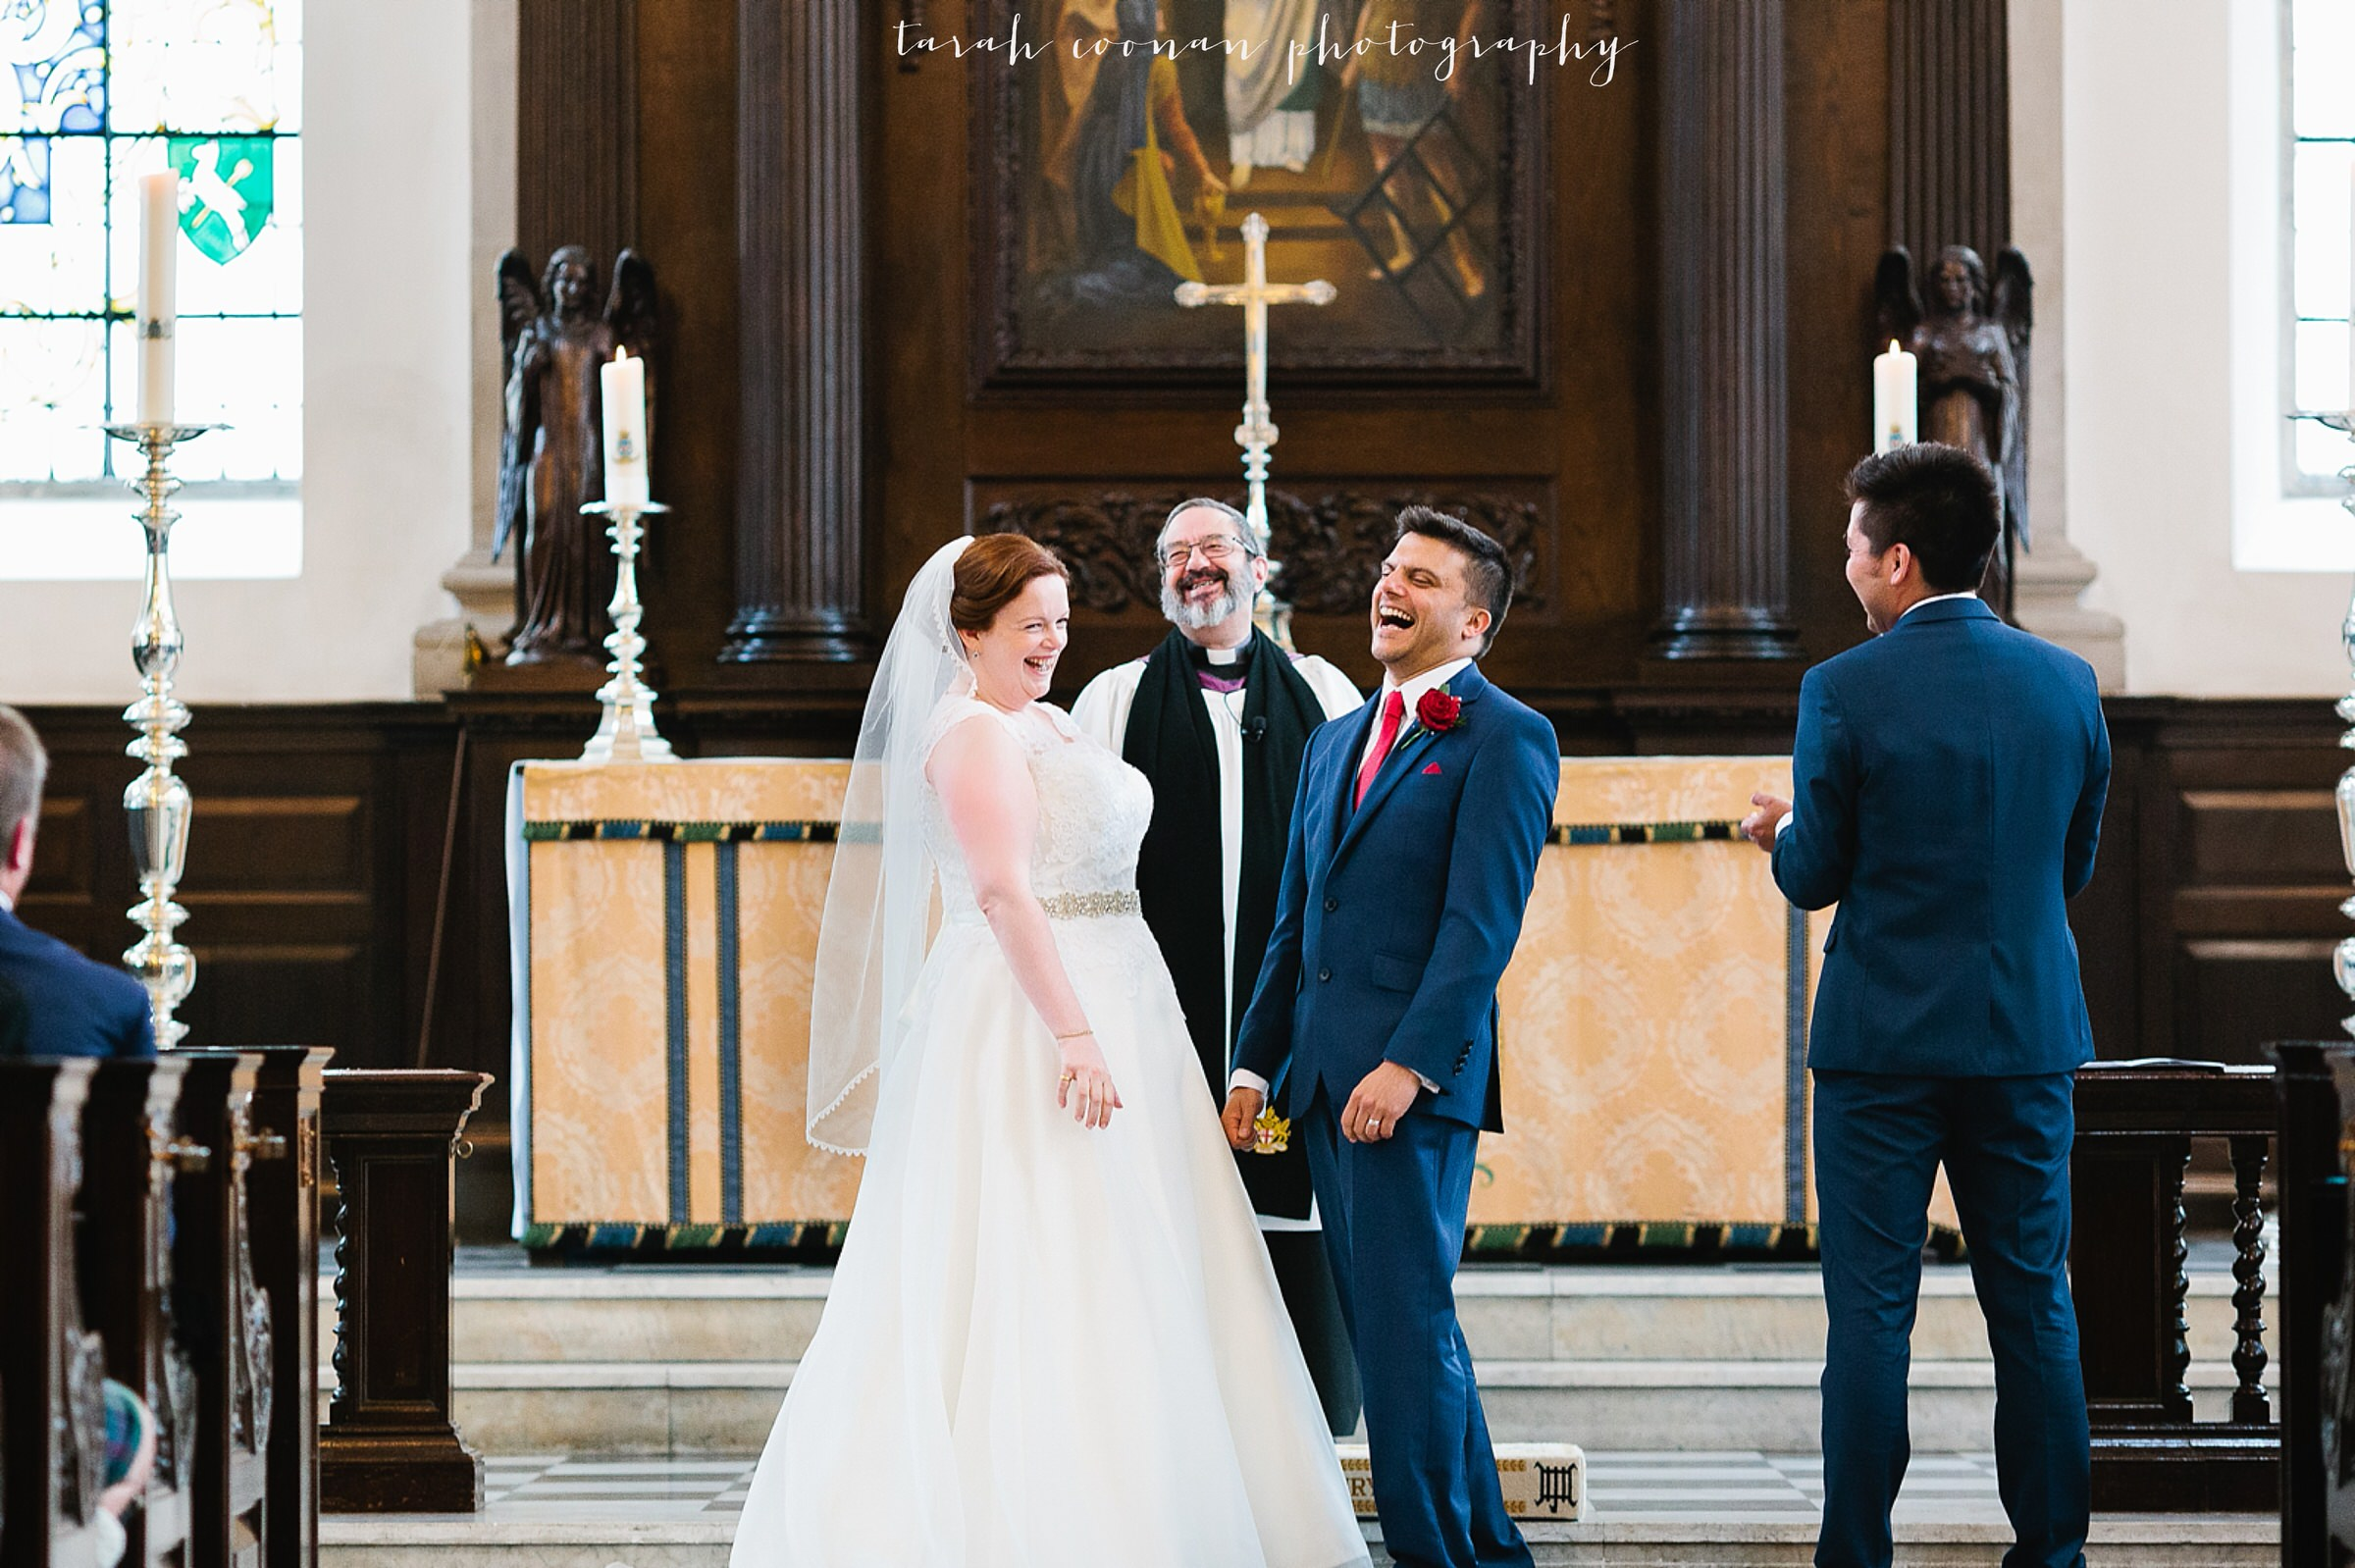 old-finsbury-town-hall-wedding_013